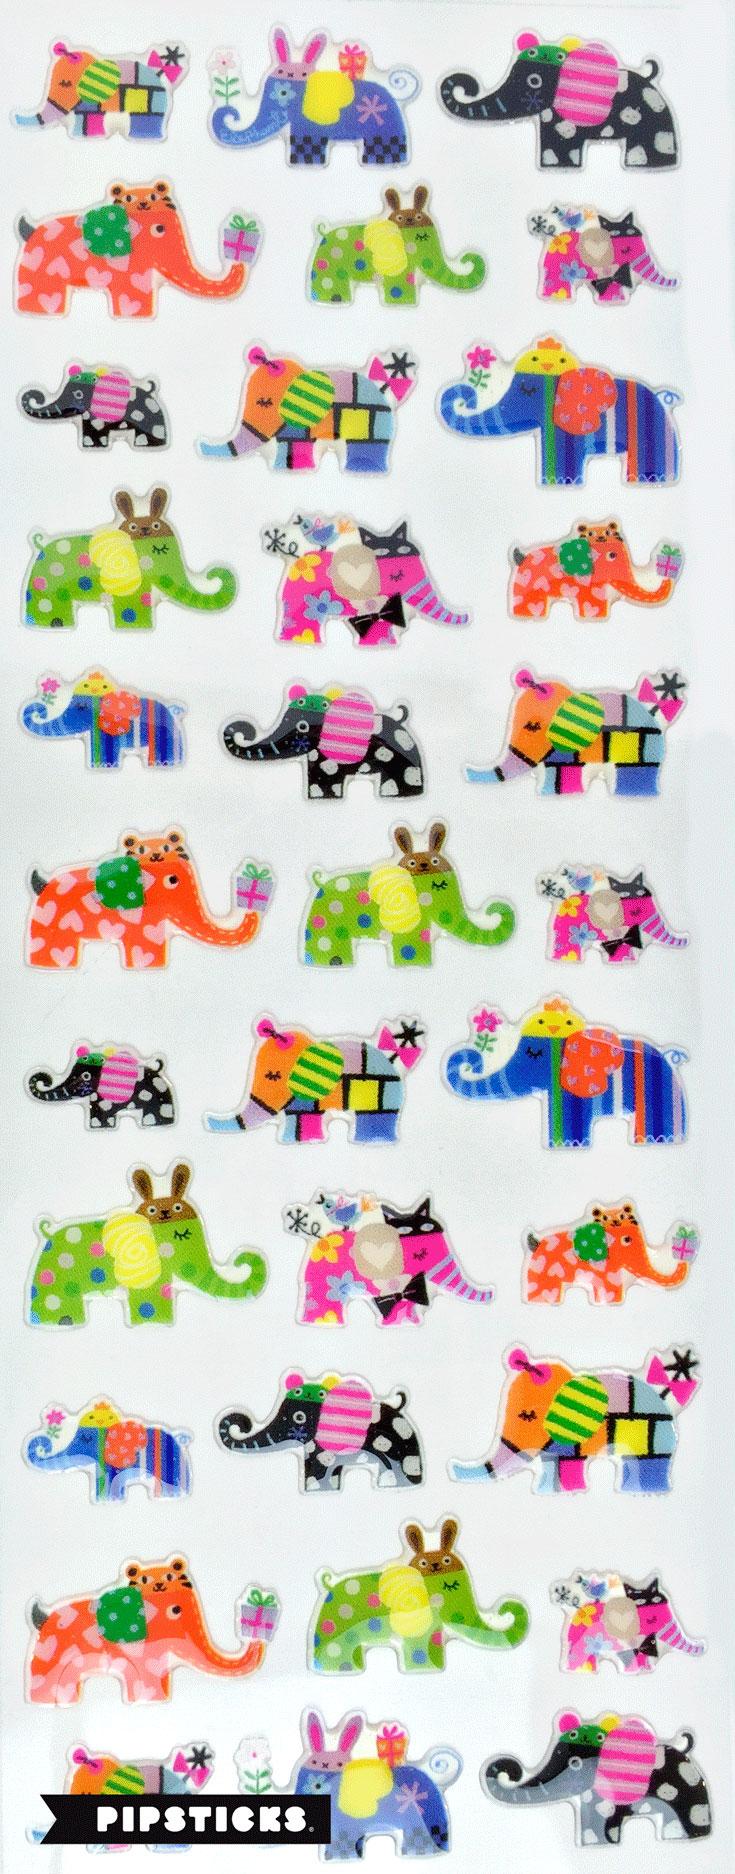 patterned-elephants_735